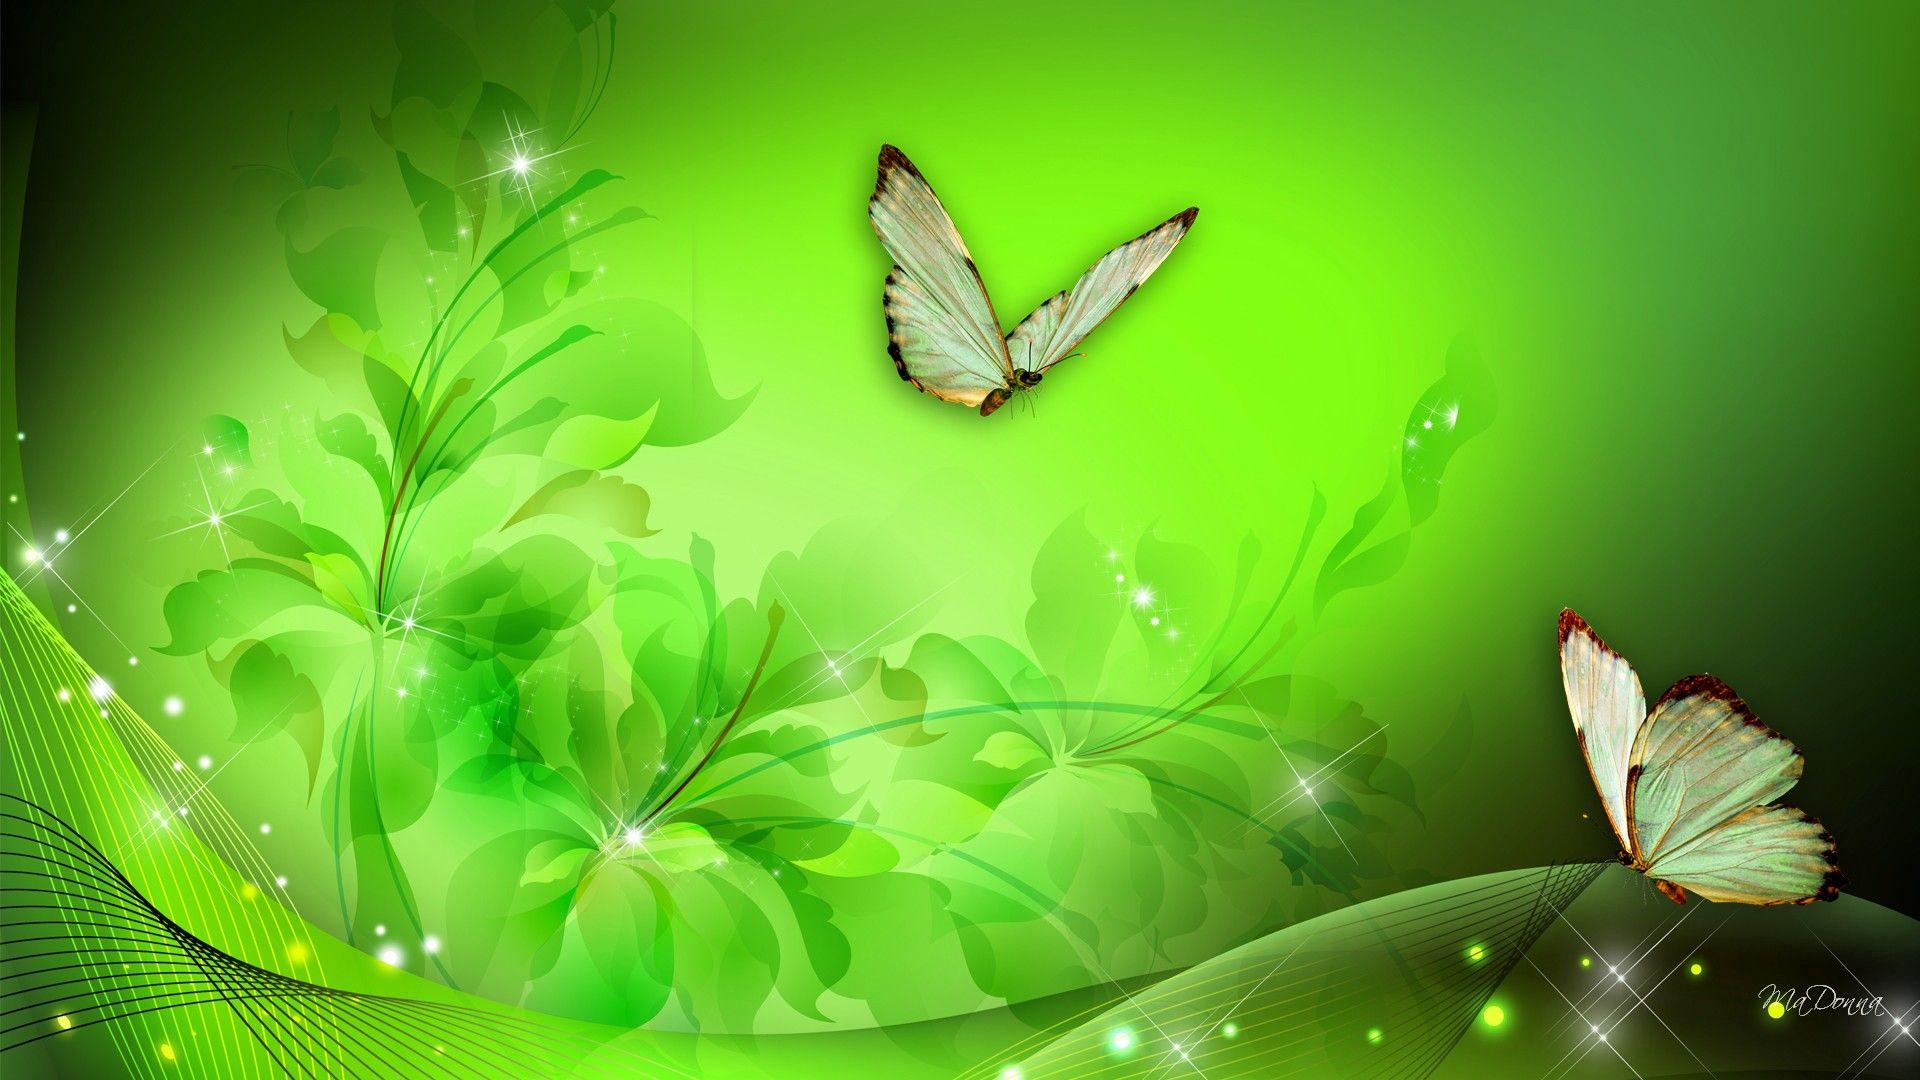 Green Butterfly Flower Wallpaper Flower Background Wallpaper Wallpaper Backgrounds Flower wallpapers full hd fantasy